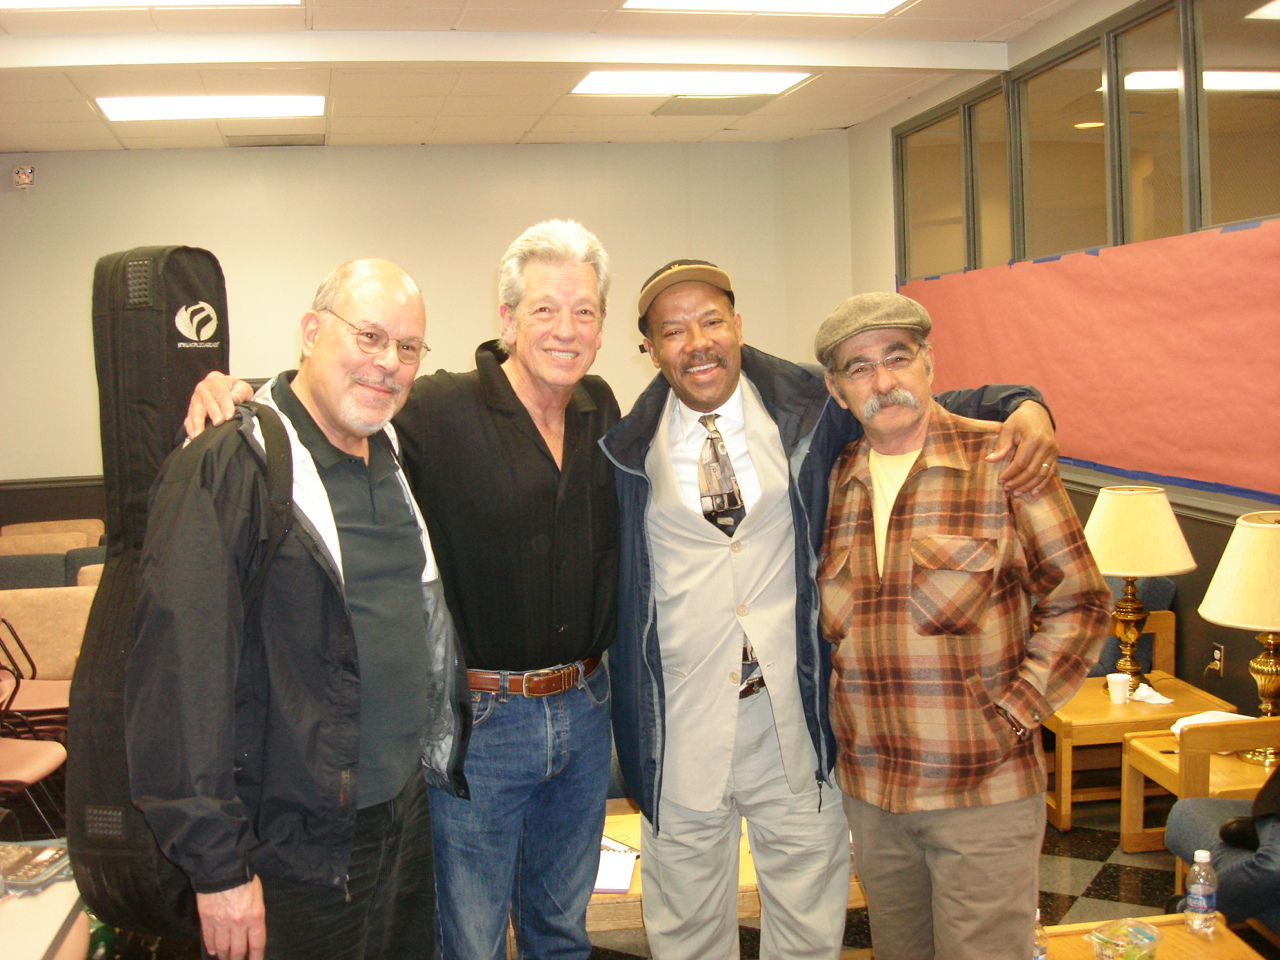 Michael with Stefan Grossman, John Hammond Jr and Roy Bookbinder, Merlefest, N. Carolina, USA (2012)